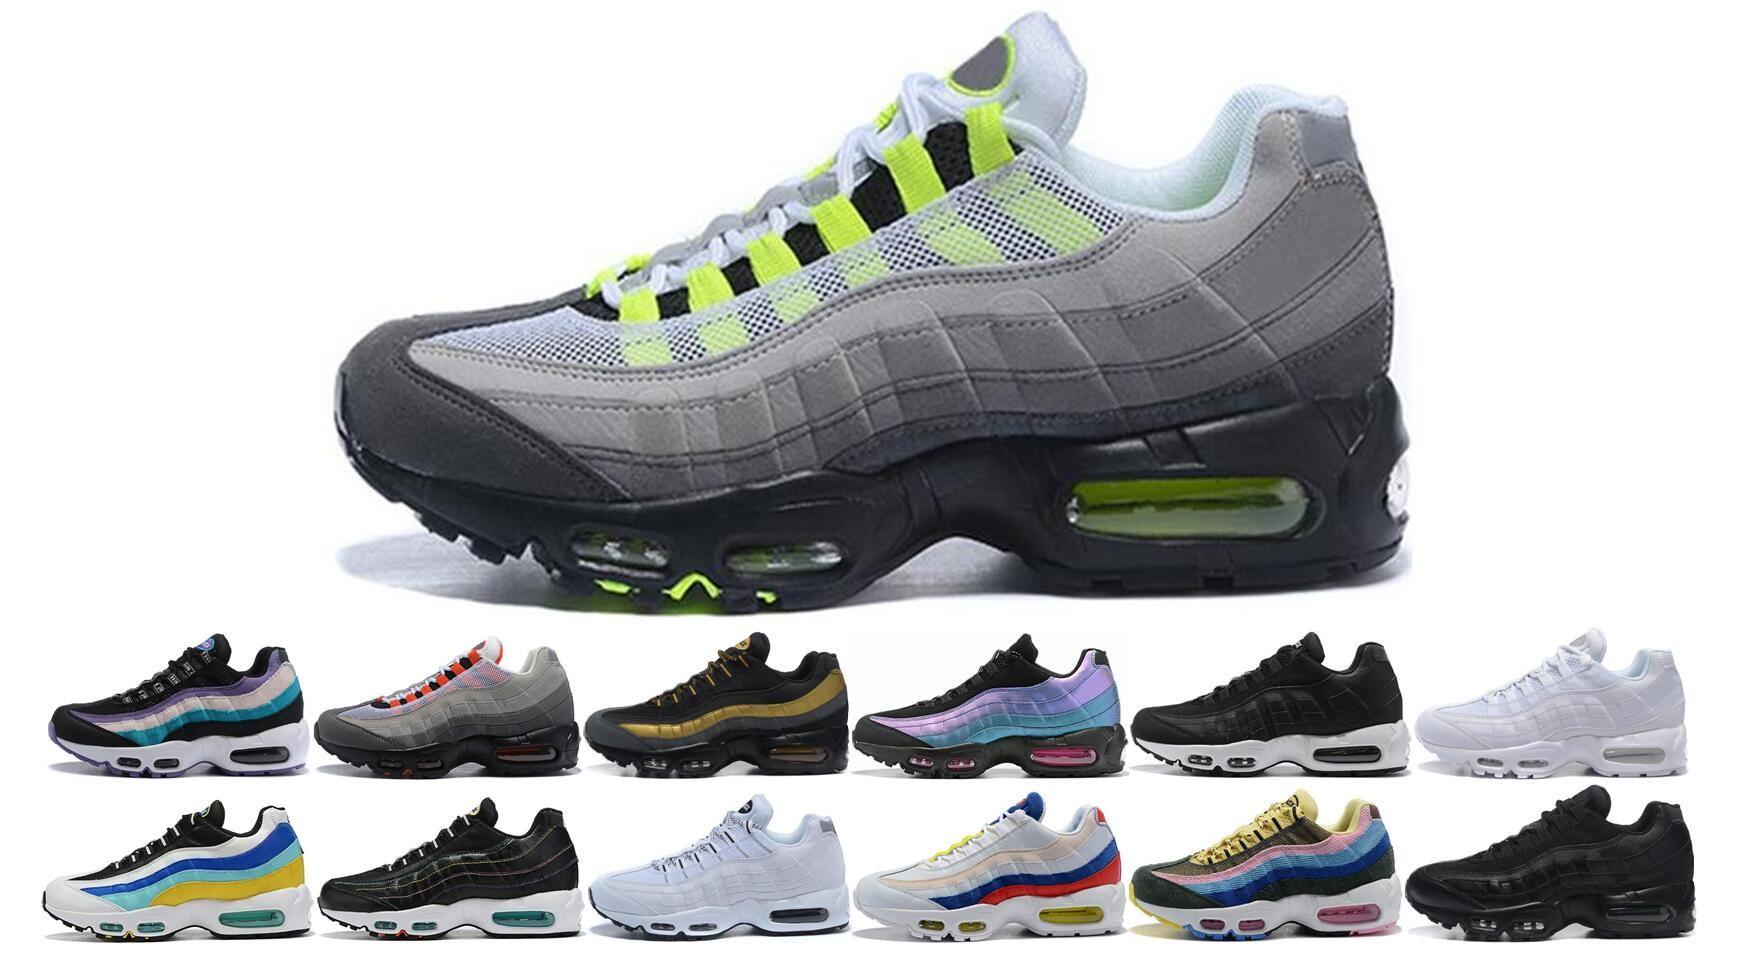 Nike Air Max vapormax 95 Designer Hommes Femmes 95 Chaussures de course SE OG Neon TT Noir Rouge Triple Blanc Aqua Ultramarine Baskets Sport